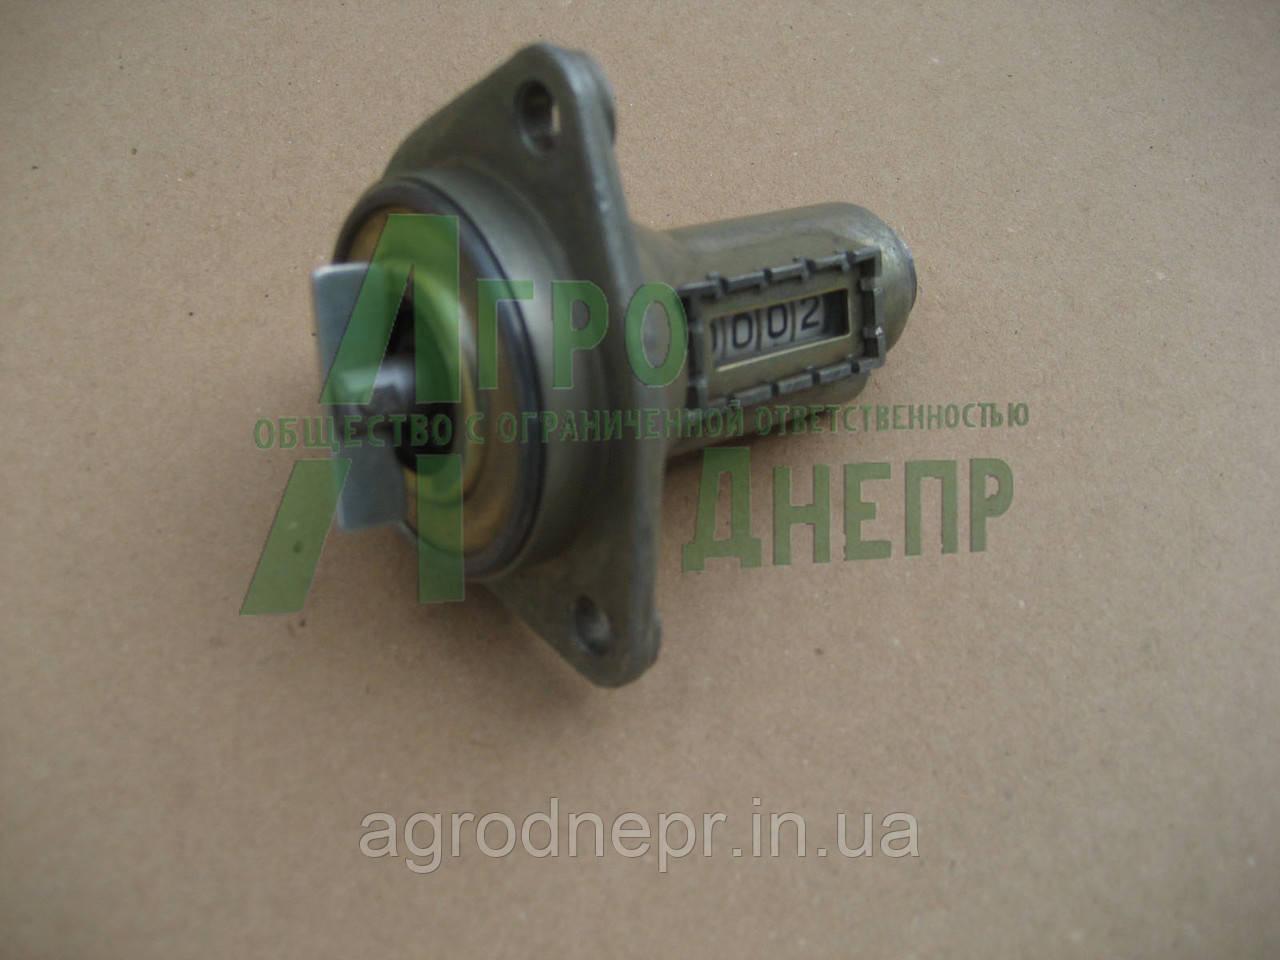 Счетчик моточасов Д-65 СЧ114Б-3818000-Г4